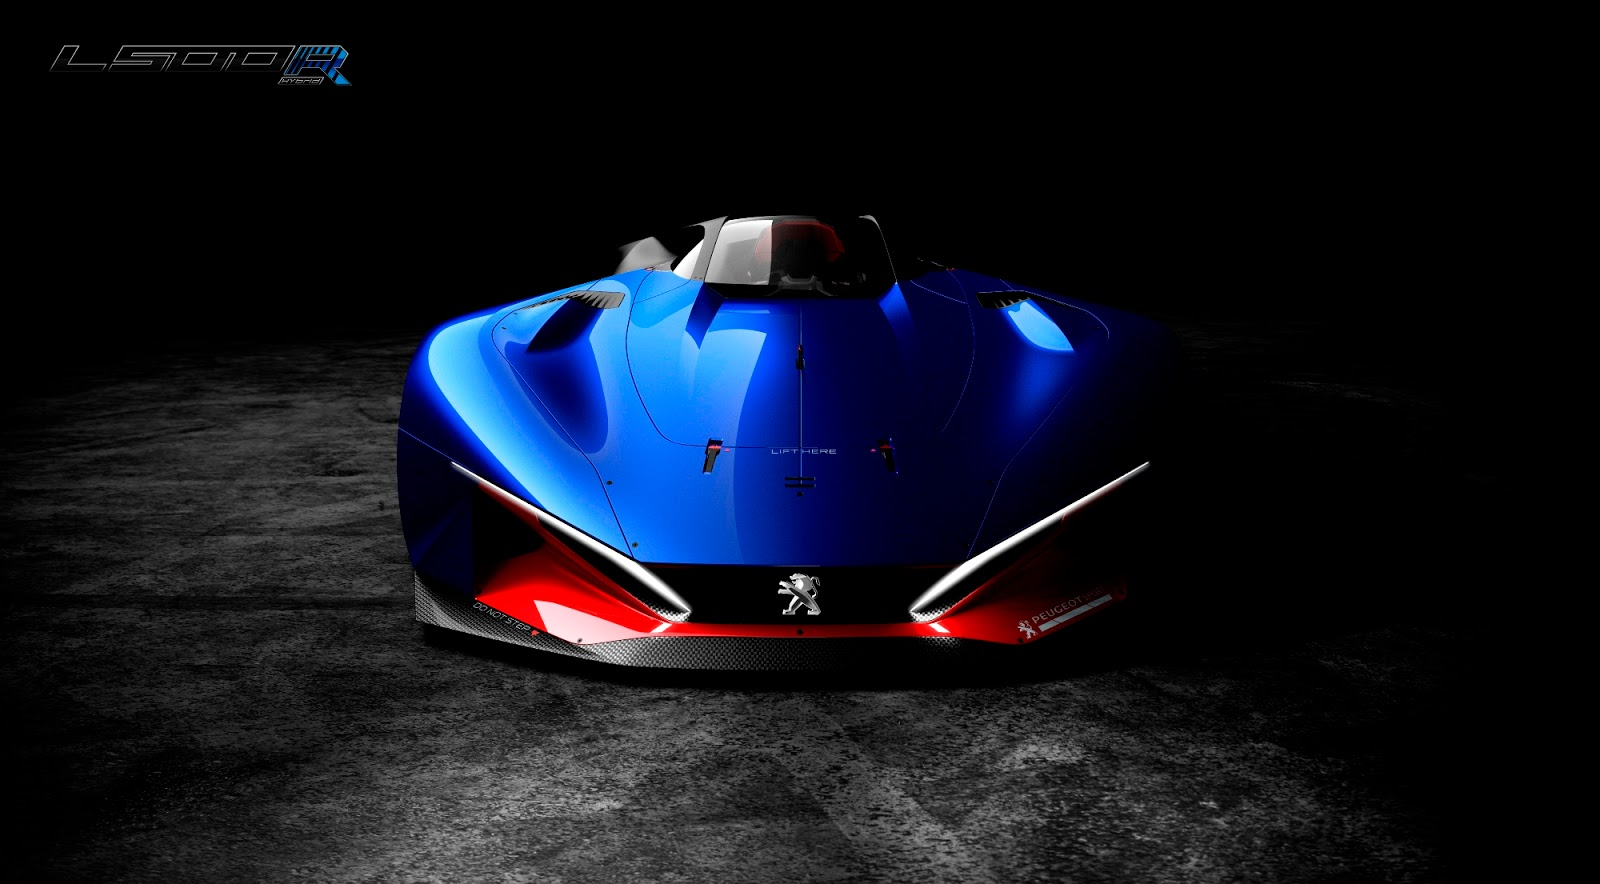 L500 022Blow Το Peugeot L500 R Hybrid δημιουργήθηκε από το παρελθόν για να διαβλέψει το μέλλον των αγώνων αυτοκινήτου! Future, Peugeot, Peugeot L45, Τεχνολογία